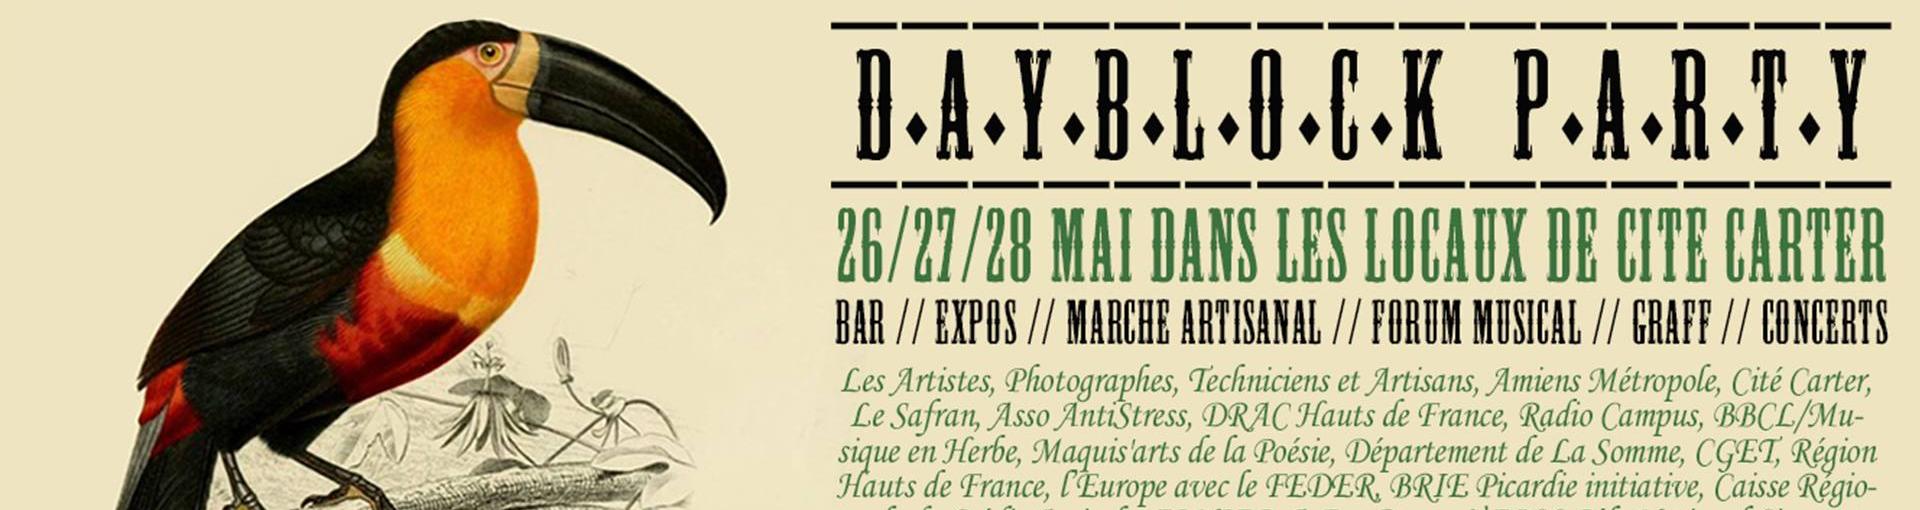 DAYBLOCK PARTY // 26, 27 ET 28 MAI